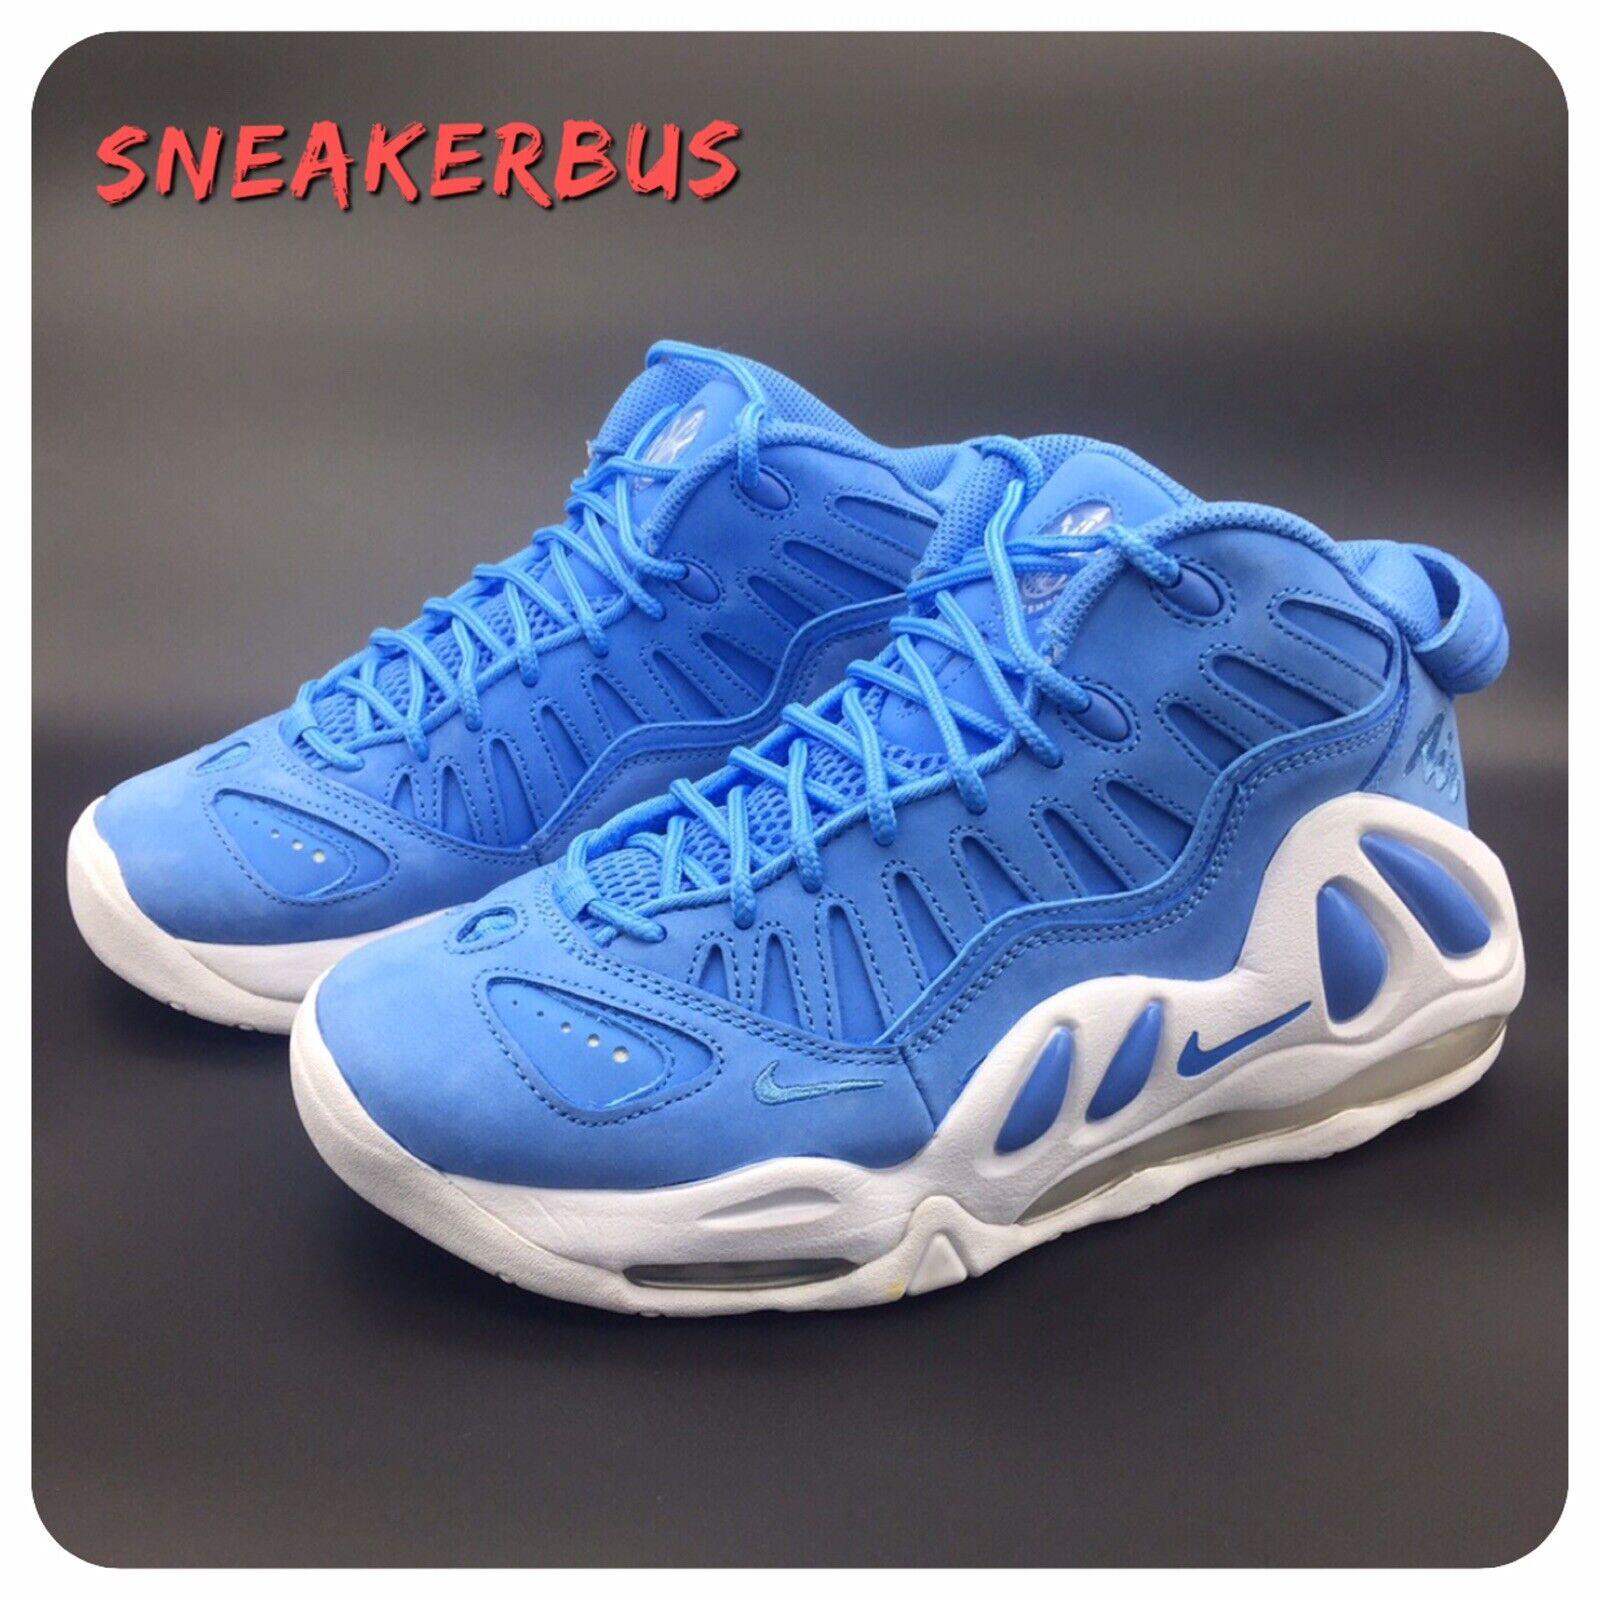 super popular 84890 87115 Nike air max 97 come qs ritmo   Offerta Speciale   Uomini Donne Scarpa